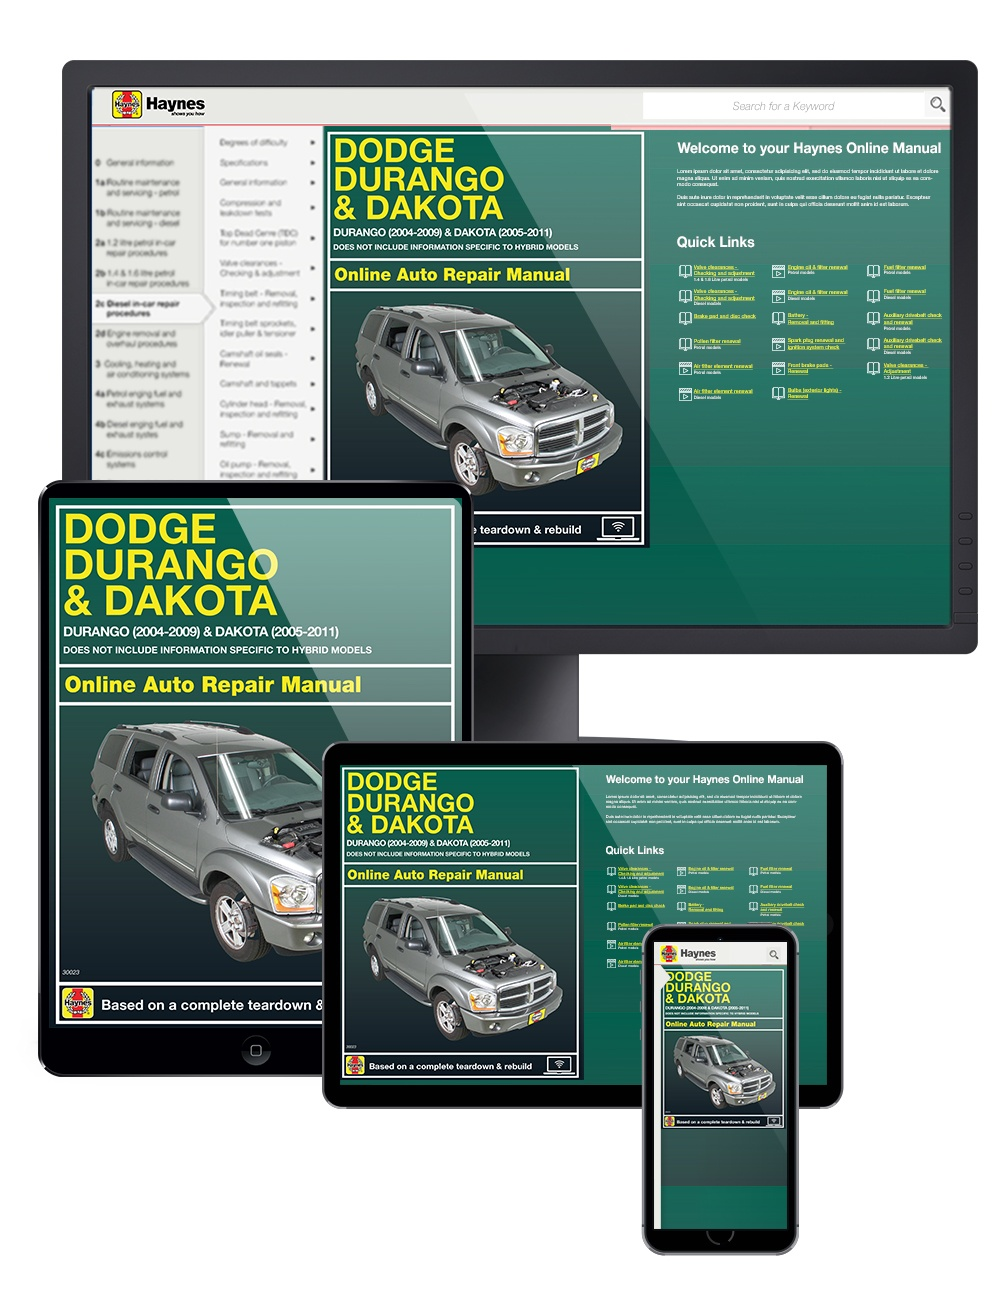 Manual cover for Dodge Durango (04-09) and Dodge Dakota (05-11) Haynes Online Manual